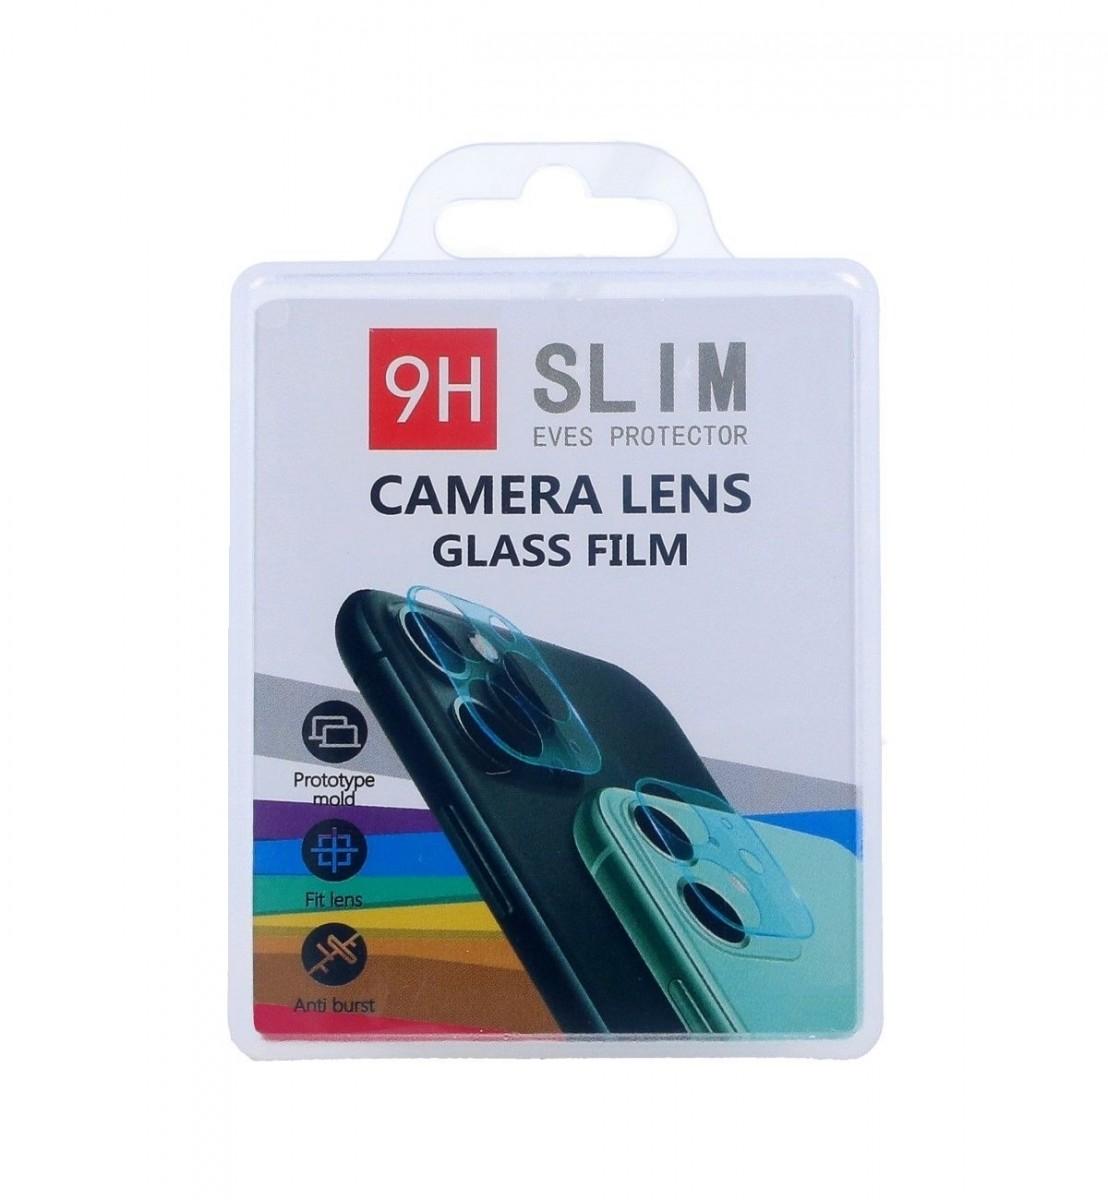 Tvrzené sklo TopQ na zadní fotoaparát Samsung S20 Ultra 5G 54776 (ochranné sklo na zadní čočku fotoaparátu Samsung S20 Ultra 5G)